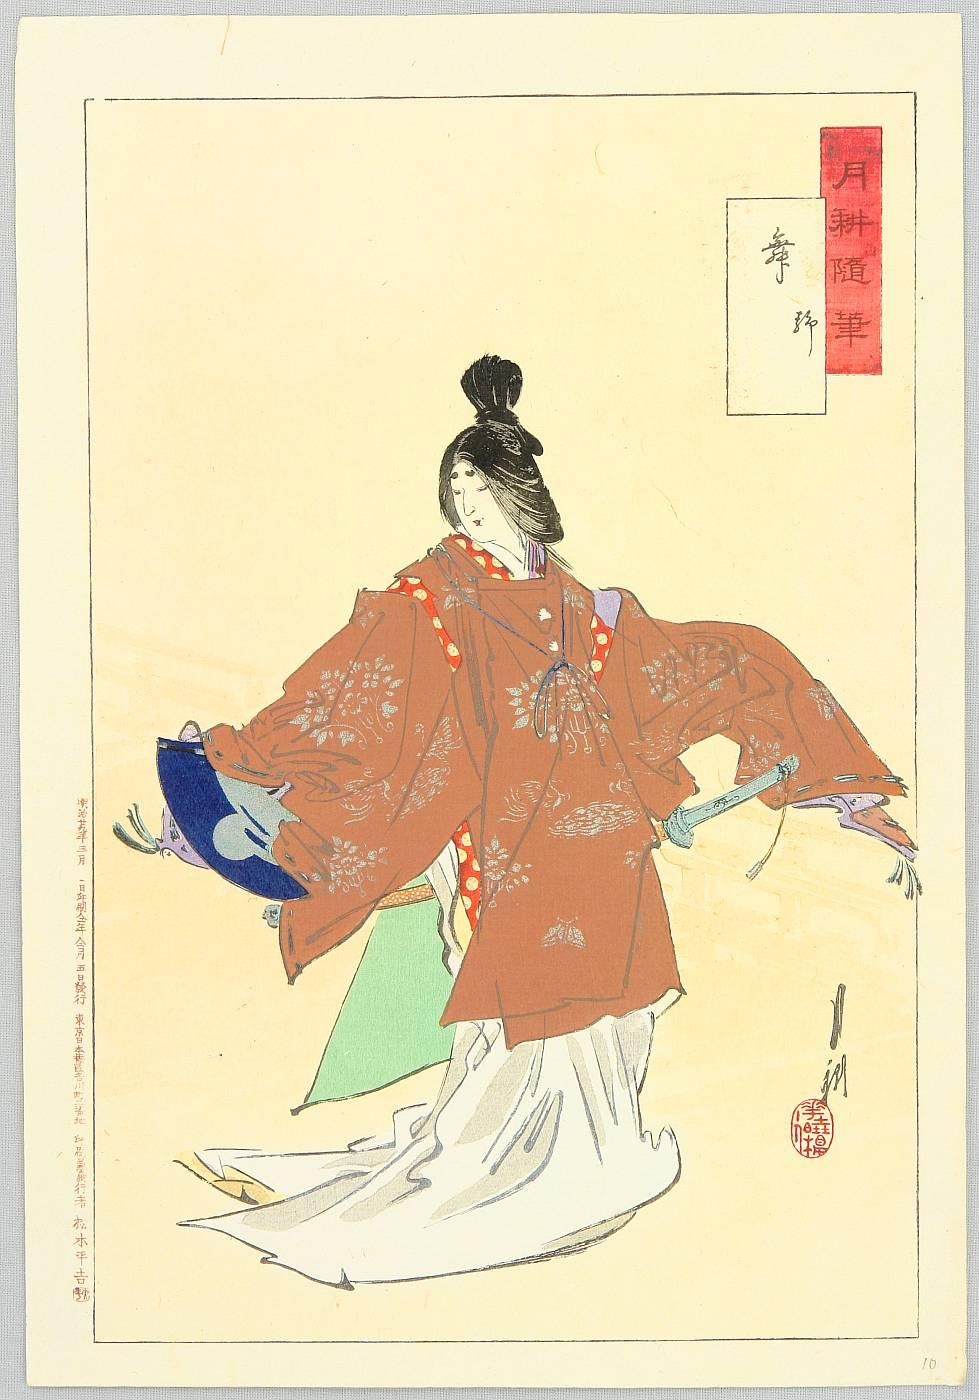 尾形月耕: Dancer - Gekko Zuihi...